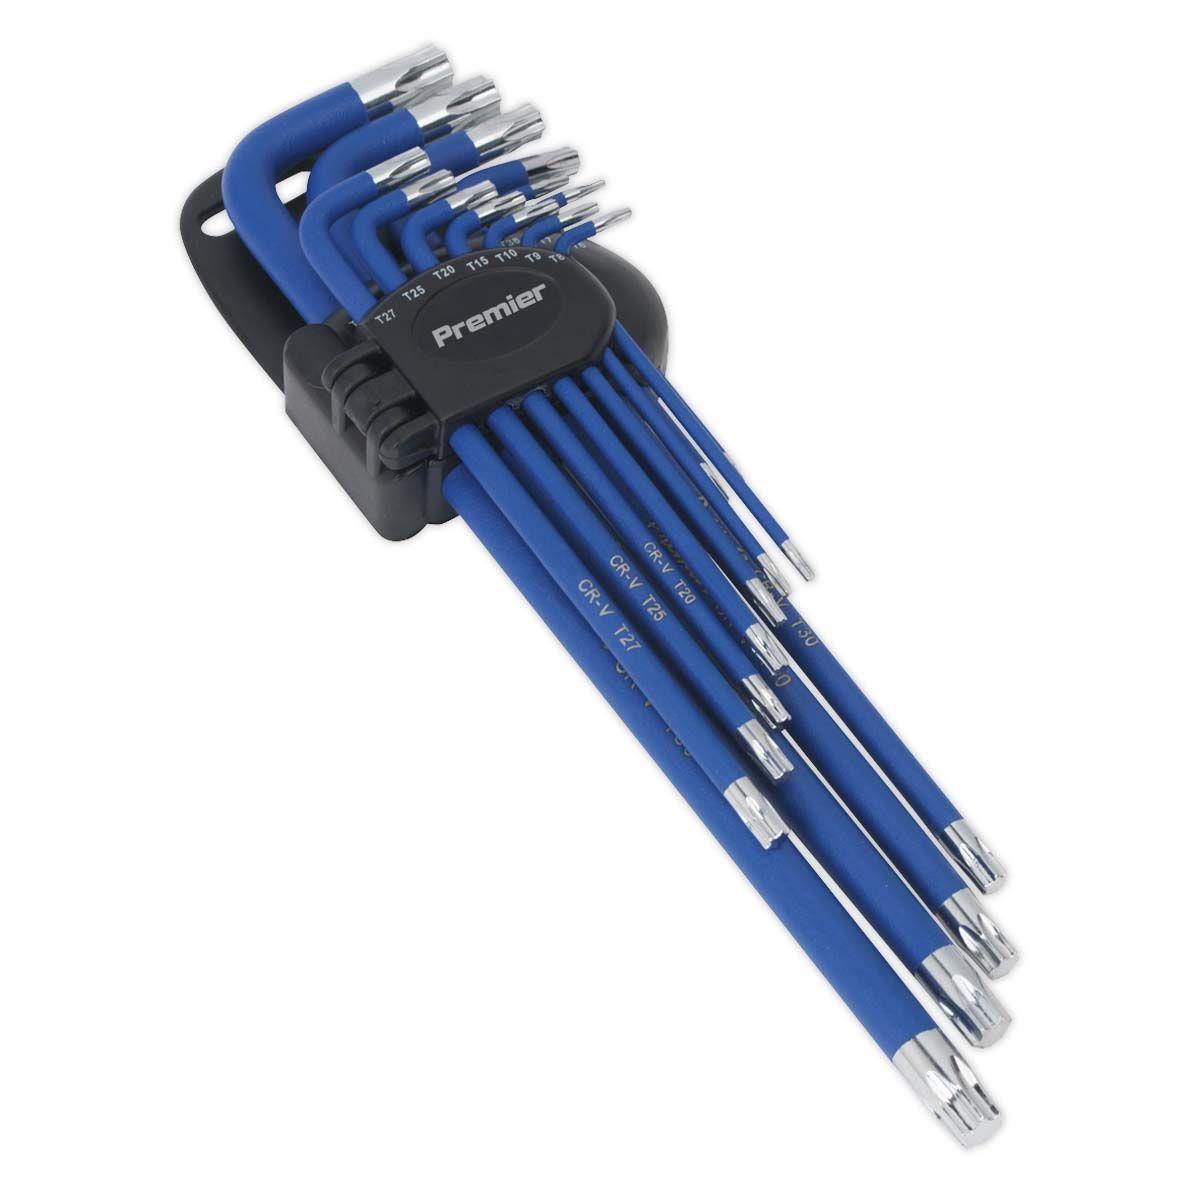 Sealey TRX-Star* Key Set 13pc Anti-Slip Extra-Long